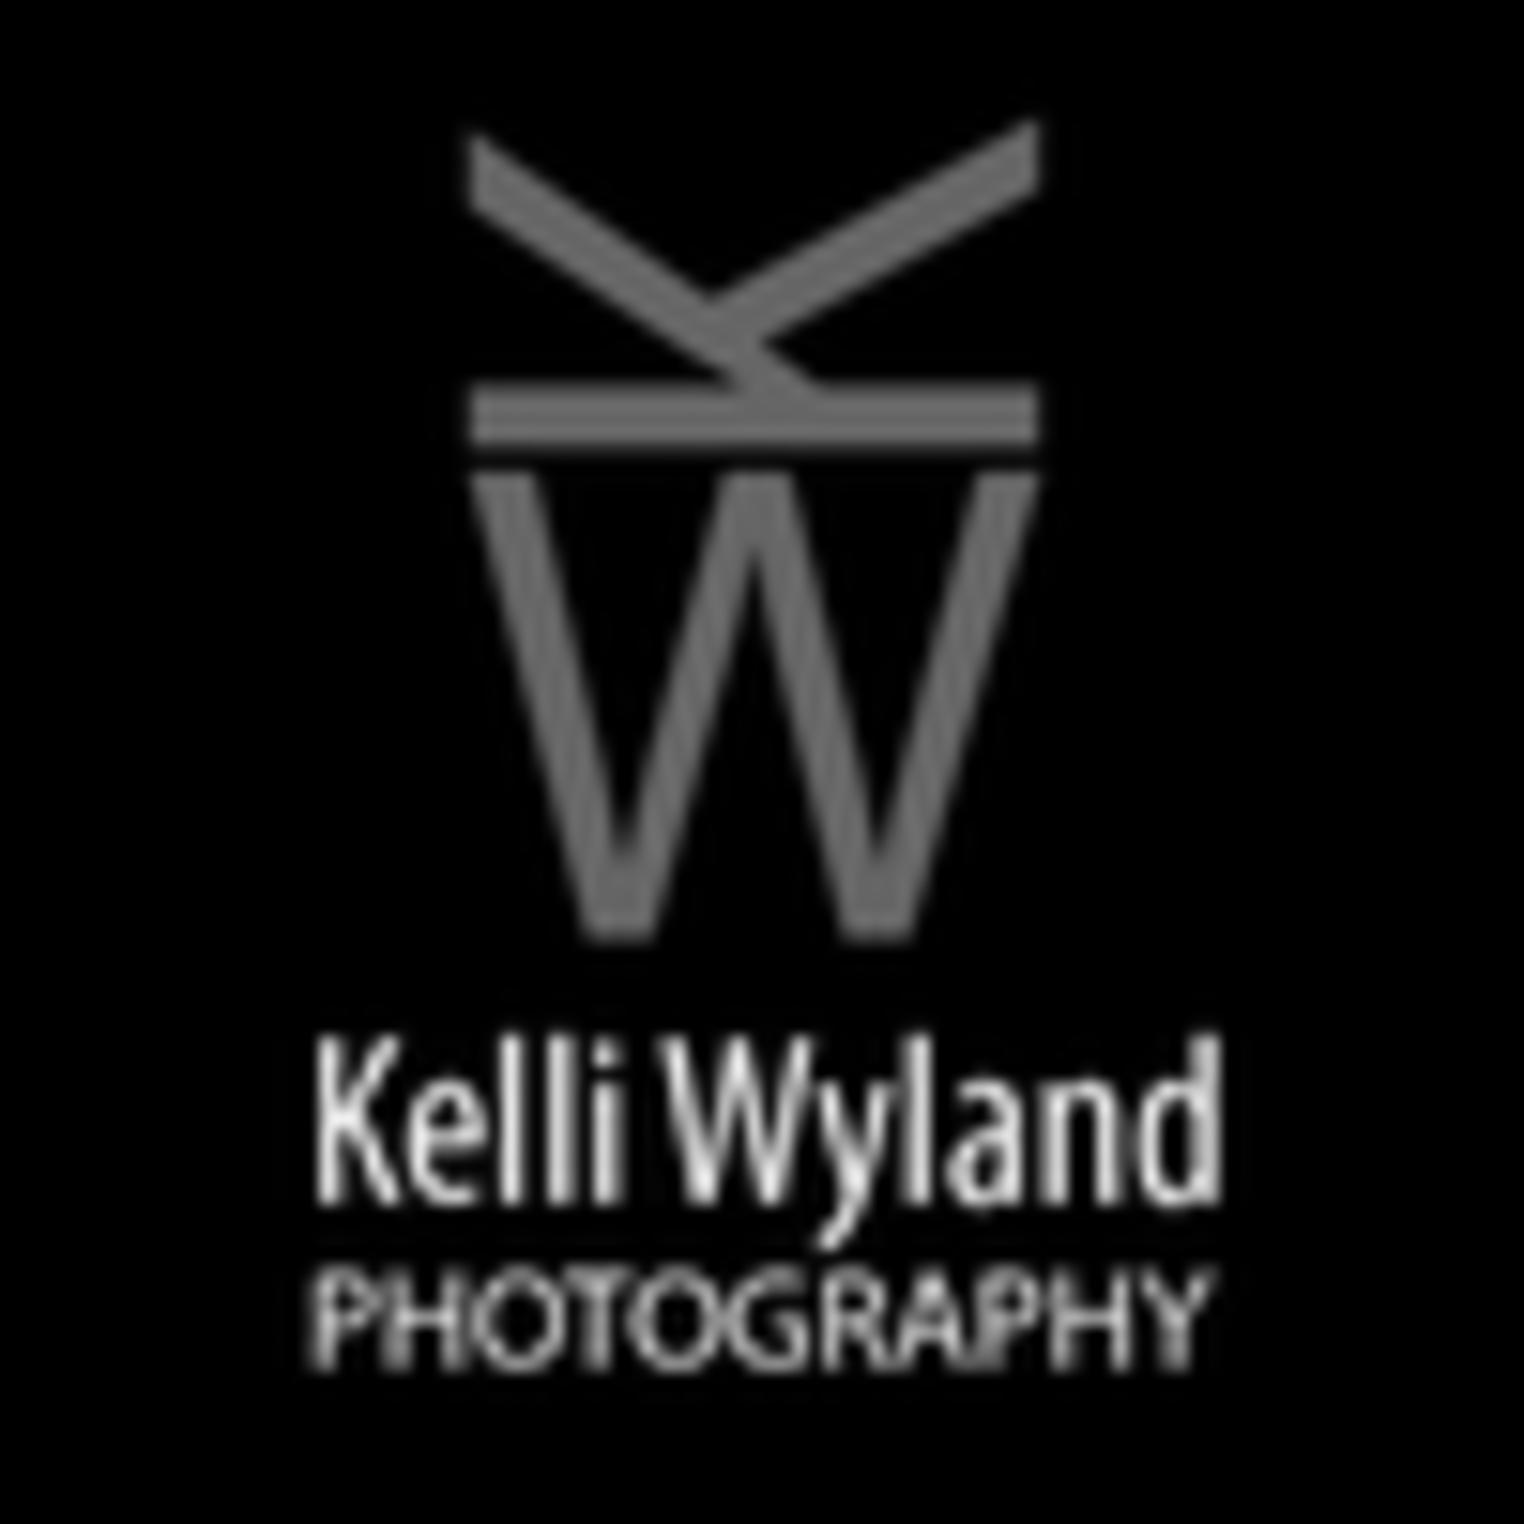 Kelli Wyland Photography